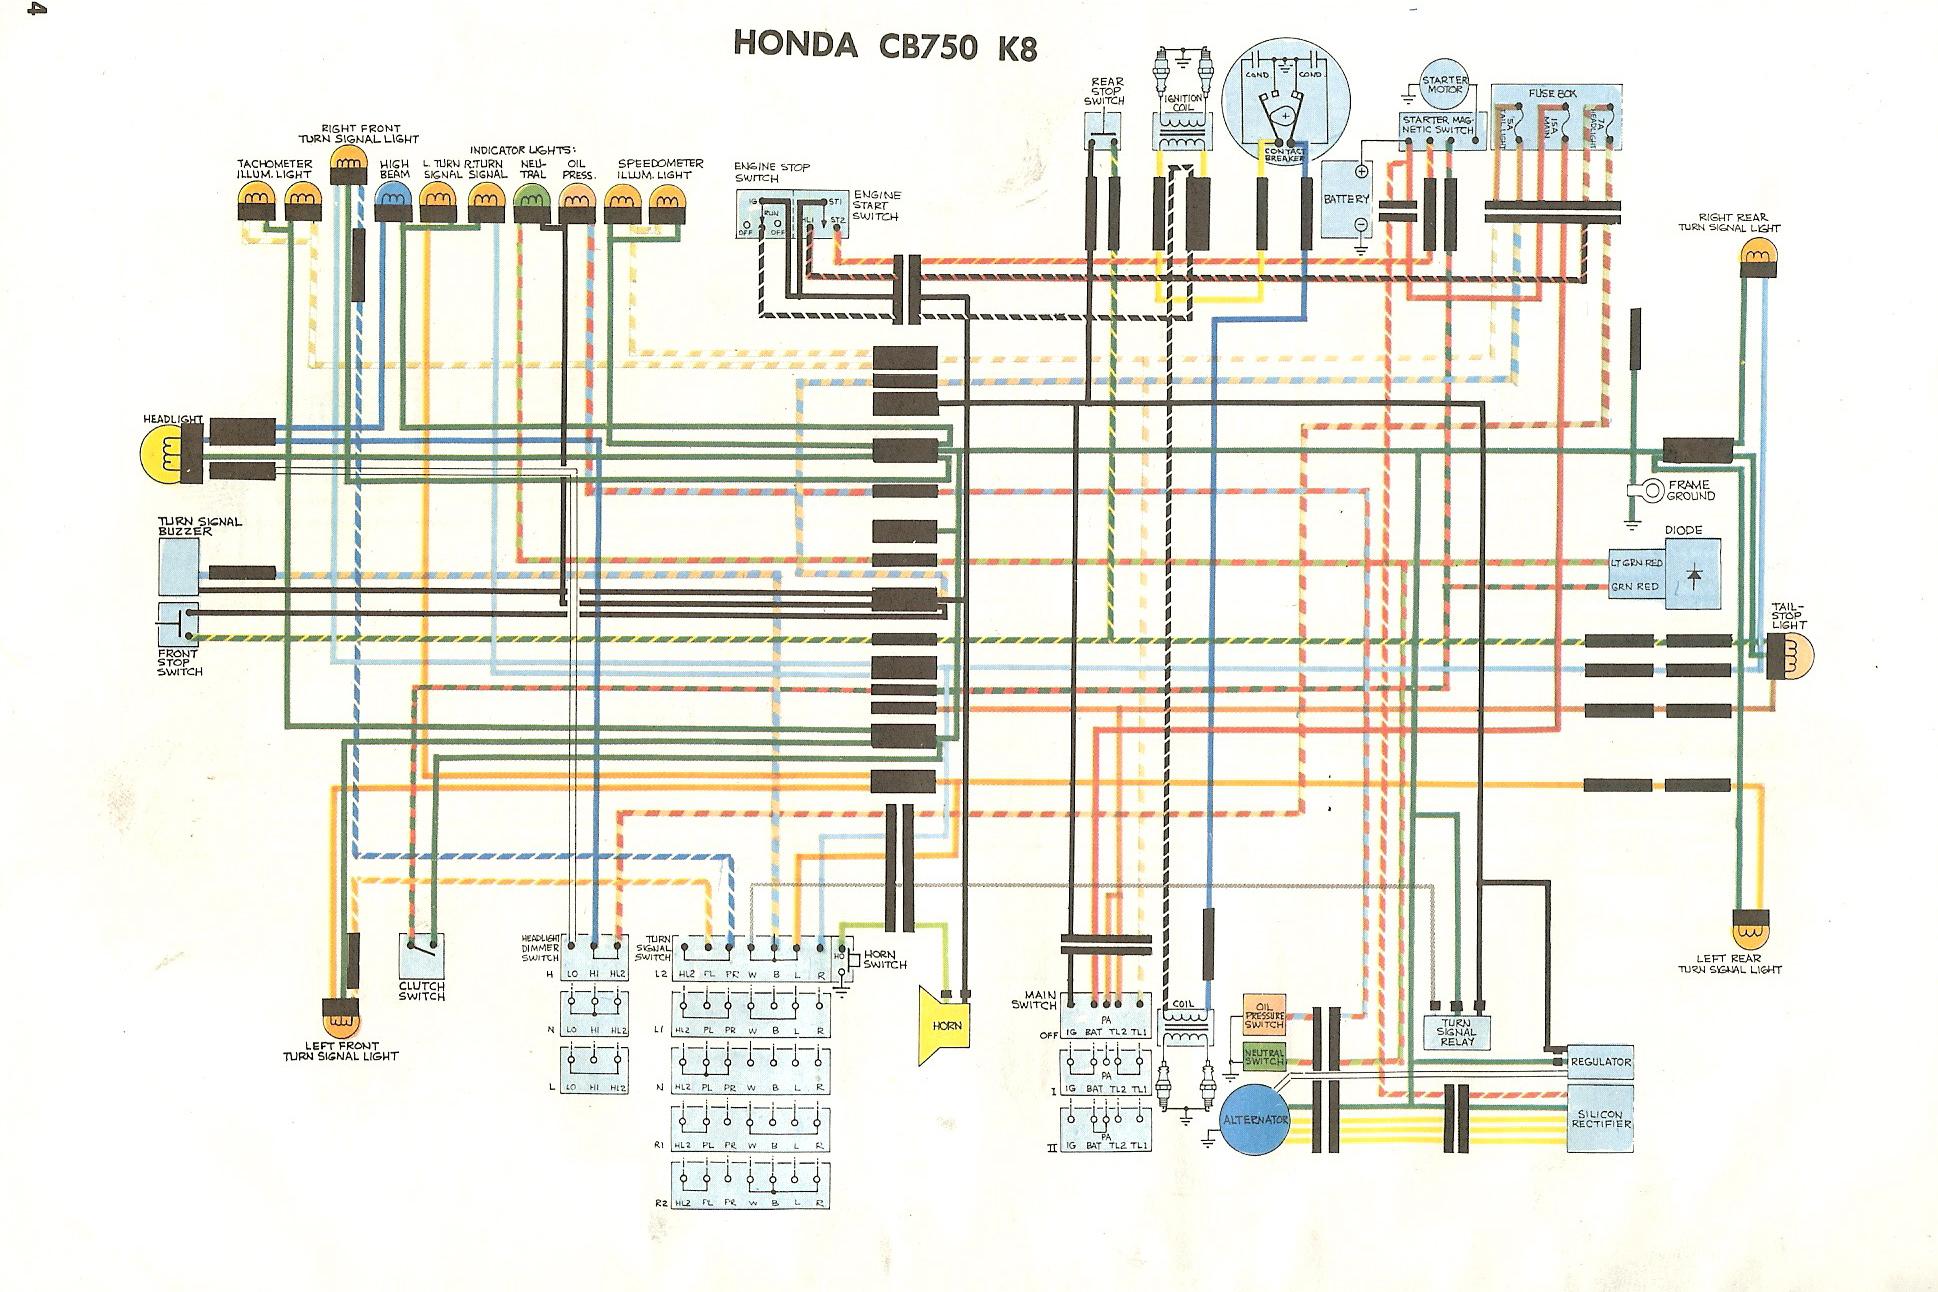 Diagram Honda Cb750 Nighthawk Wiring Diagram Full Version Hd Quality Wiring Diagram Cinchdiagrams Portoturisticodilovere It